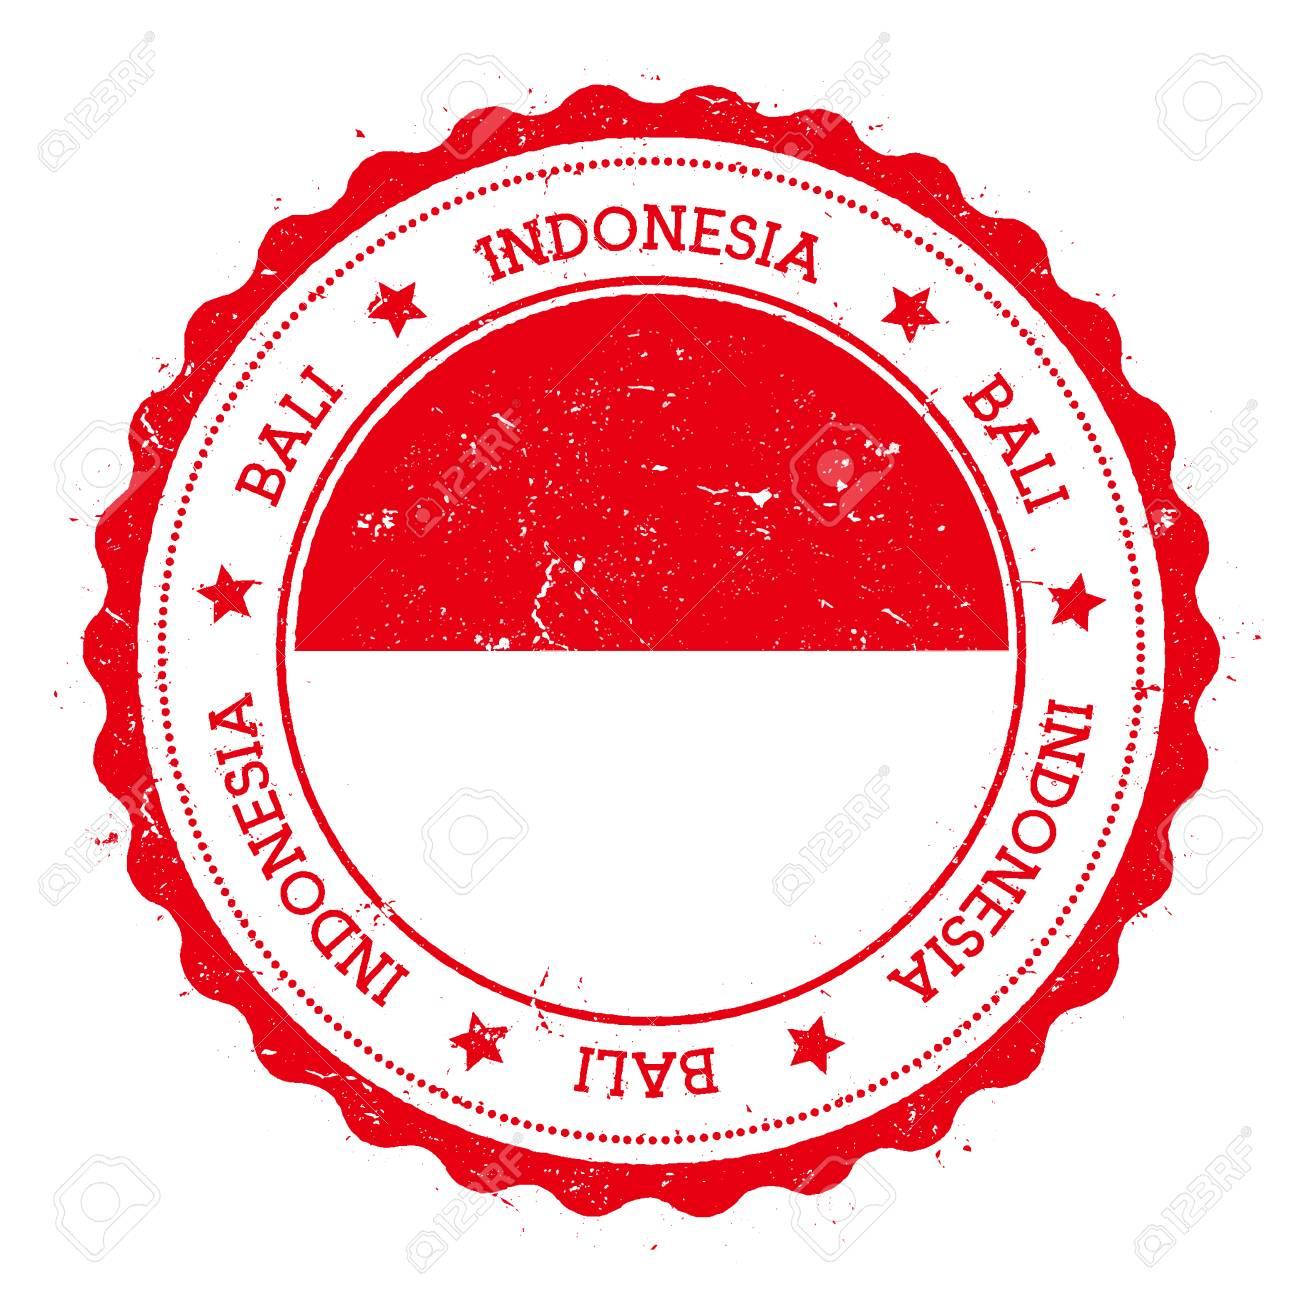 Bali Flag Badge Vintage Travel Stamp With Circular Text Stars